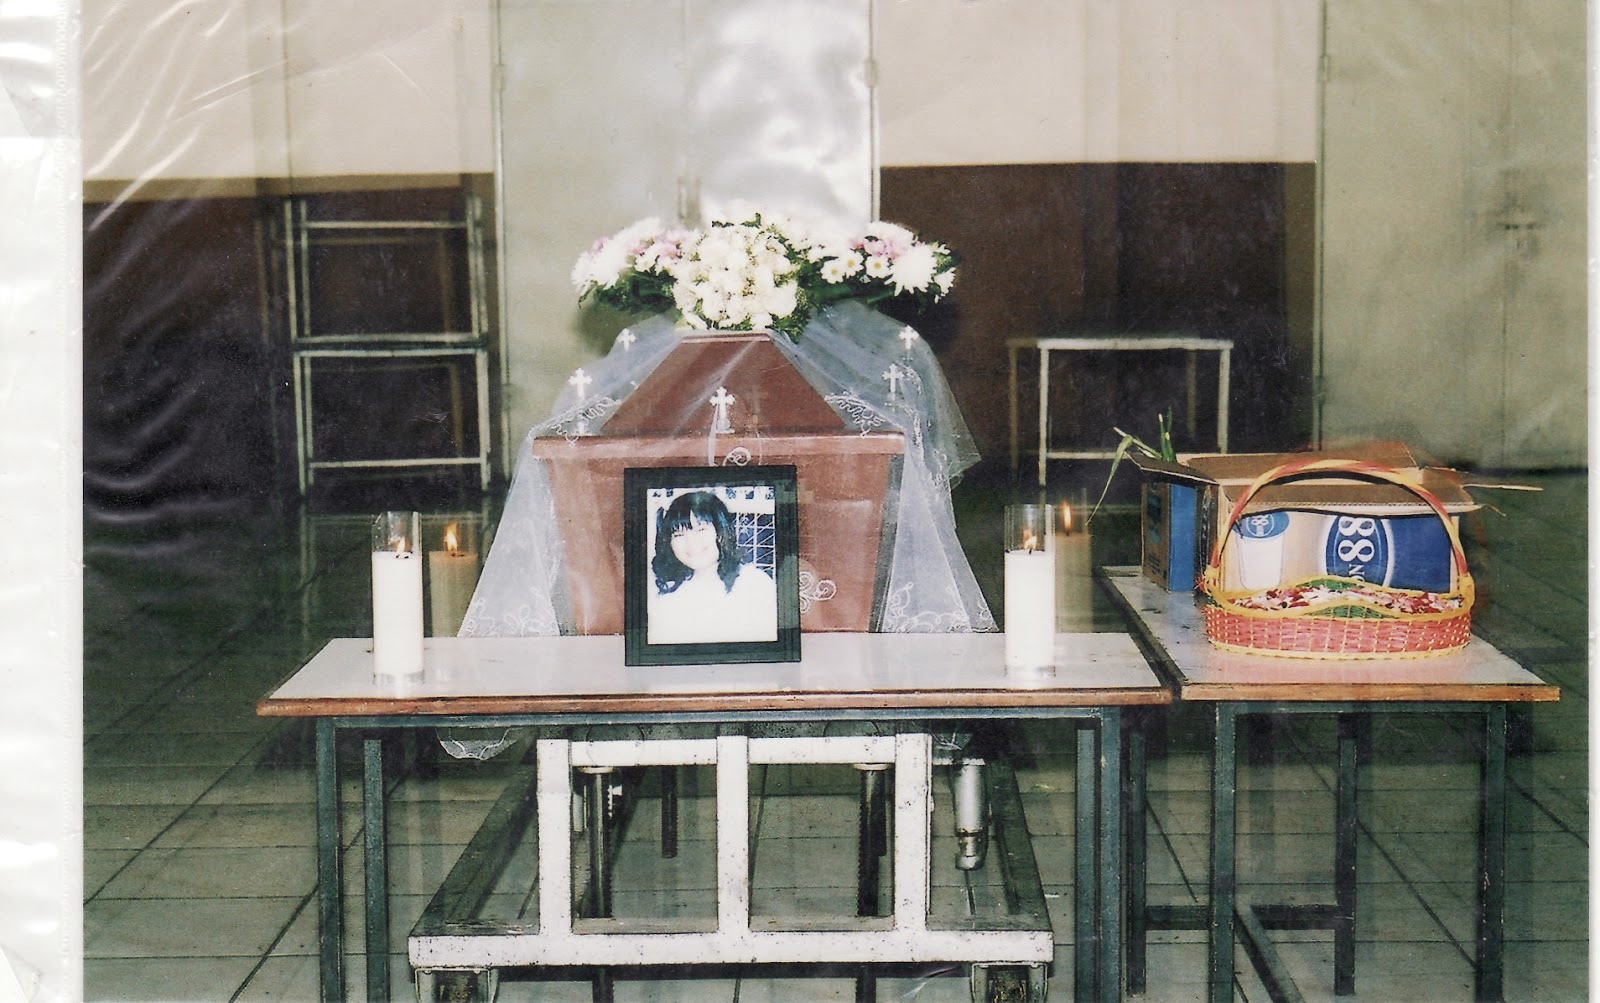 Foto Penampakkan Yesus Kristus pada pintu kremasi, foto diambil oleh